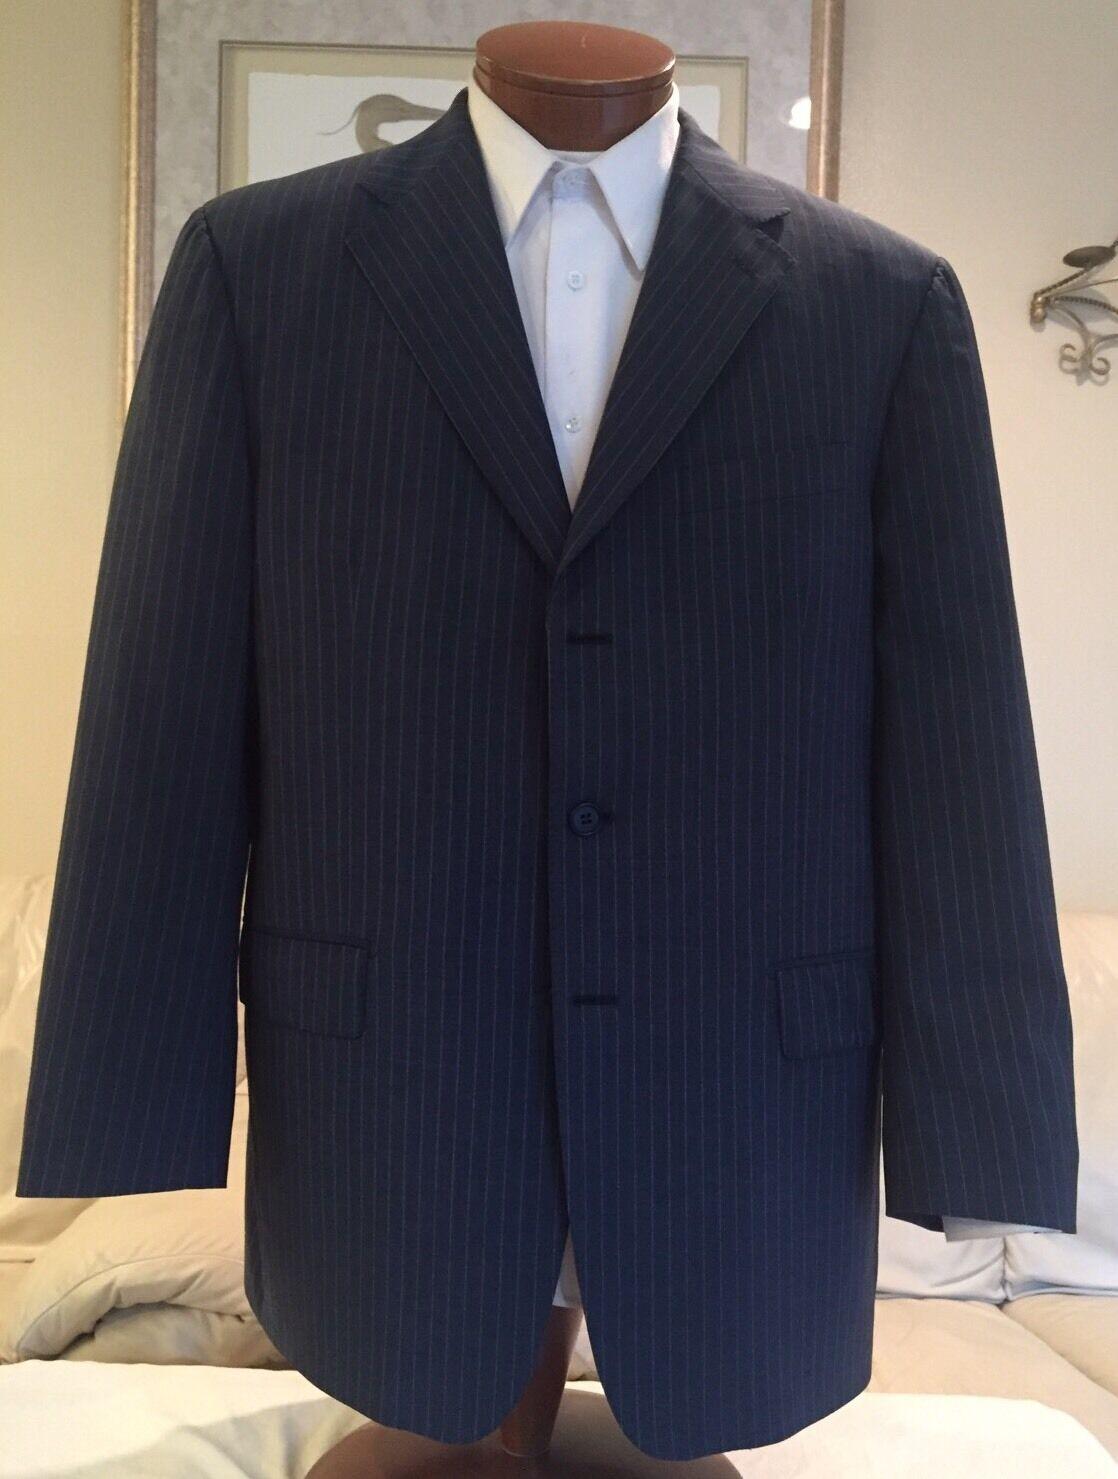 Faconnable Mens Navy bluee Stripe 3 Btn 2 Vent Wool Mohair Blazer Sz 44 R MINT